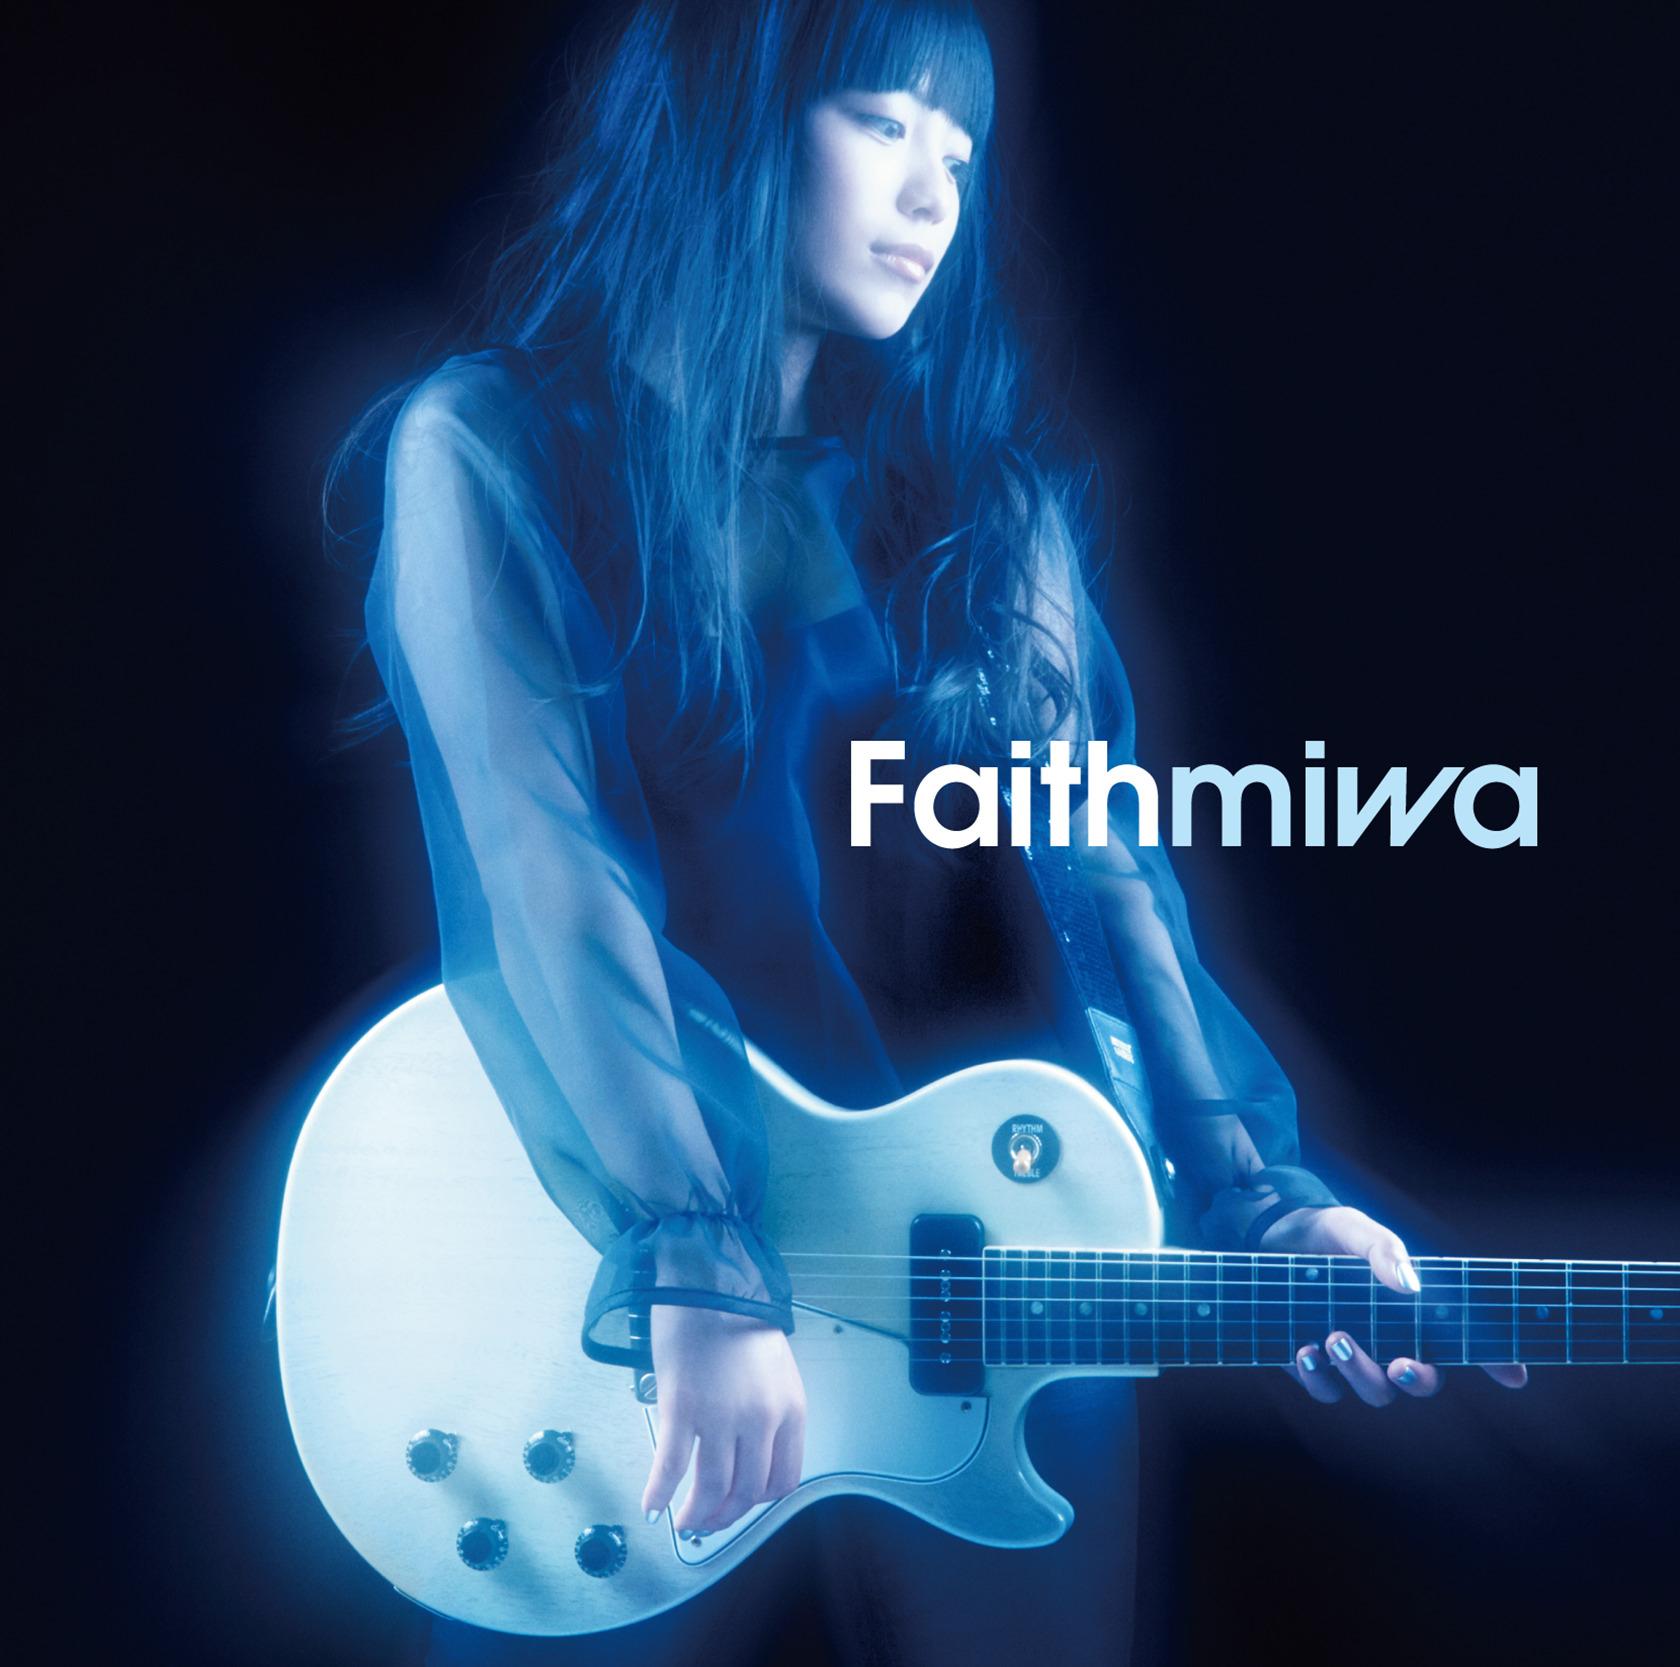 miwa (ミワ)13thシングル『Faith (フェイス)』(2014年2月12日発売) 高画質ジャケット画像